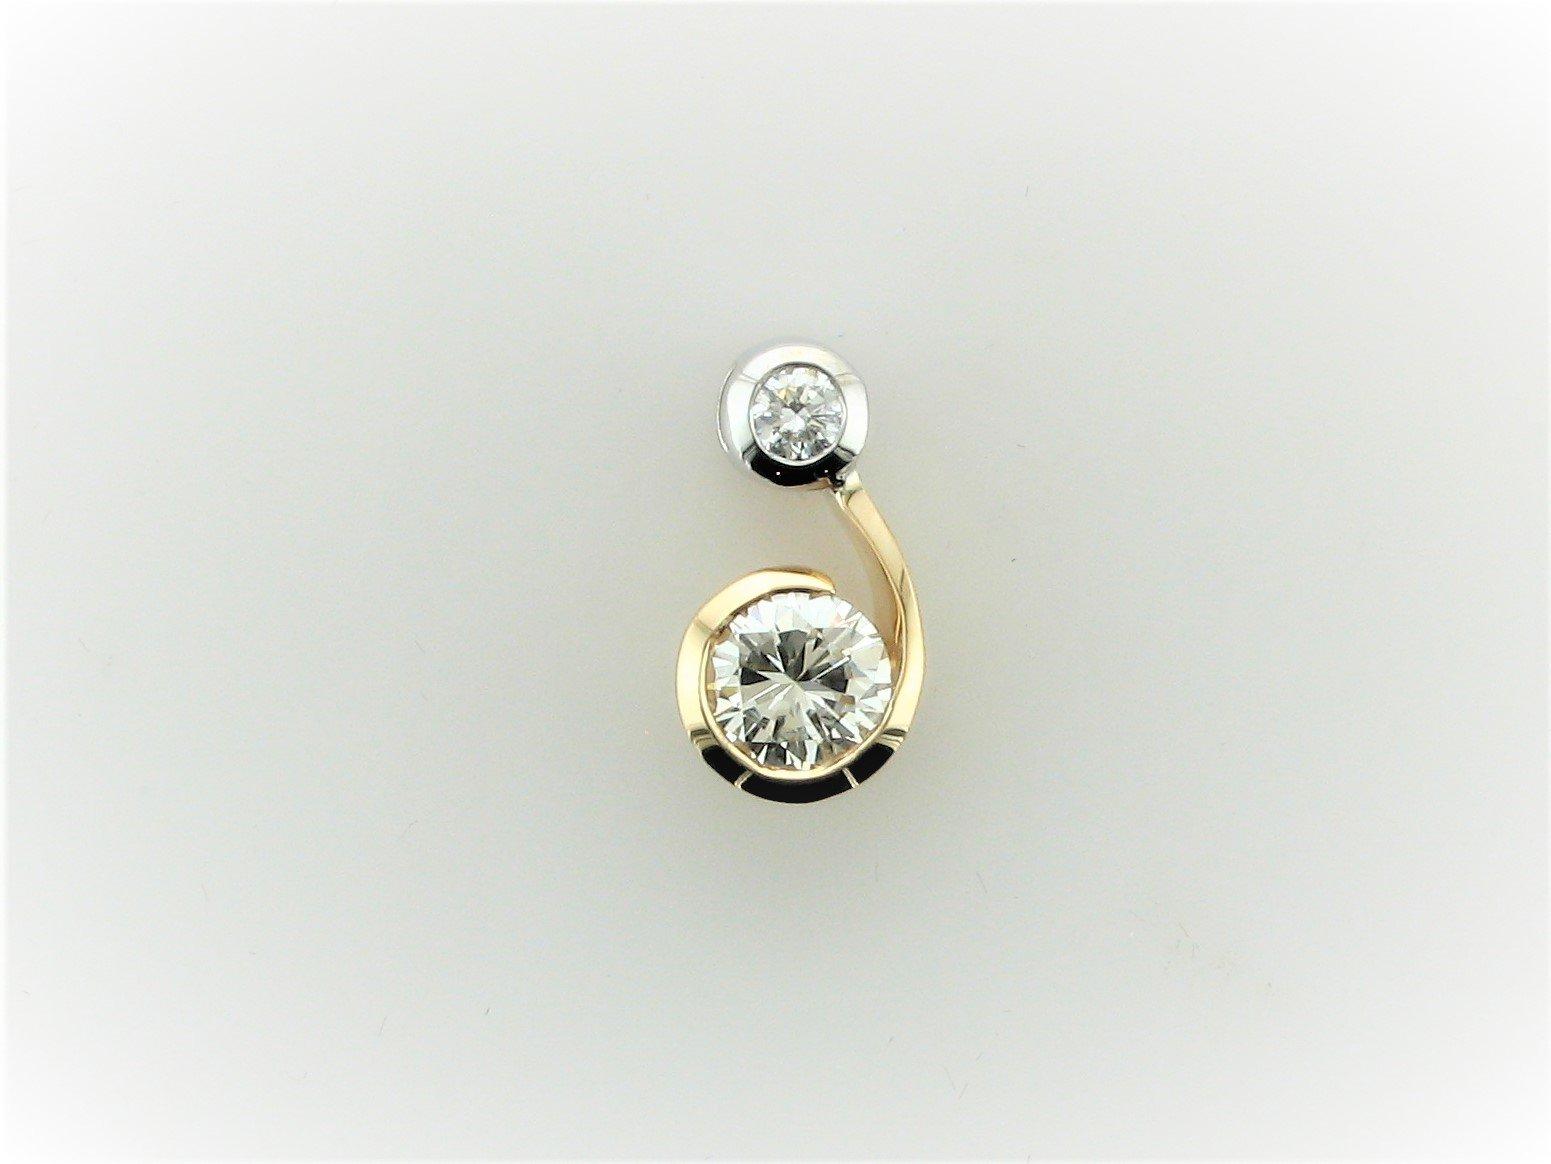 .75 Carat Diamond Pendant Set in 14 Karat Yellow and White Gold